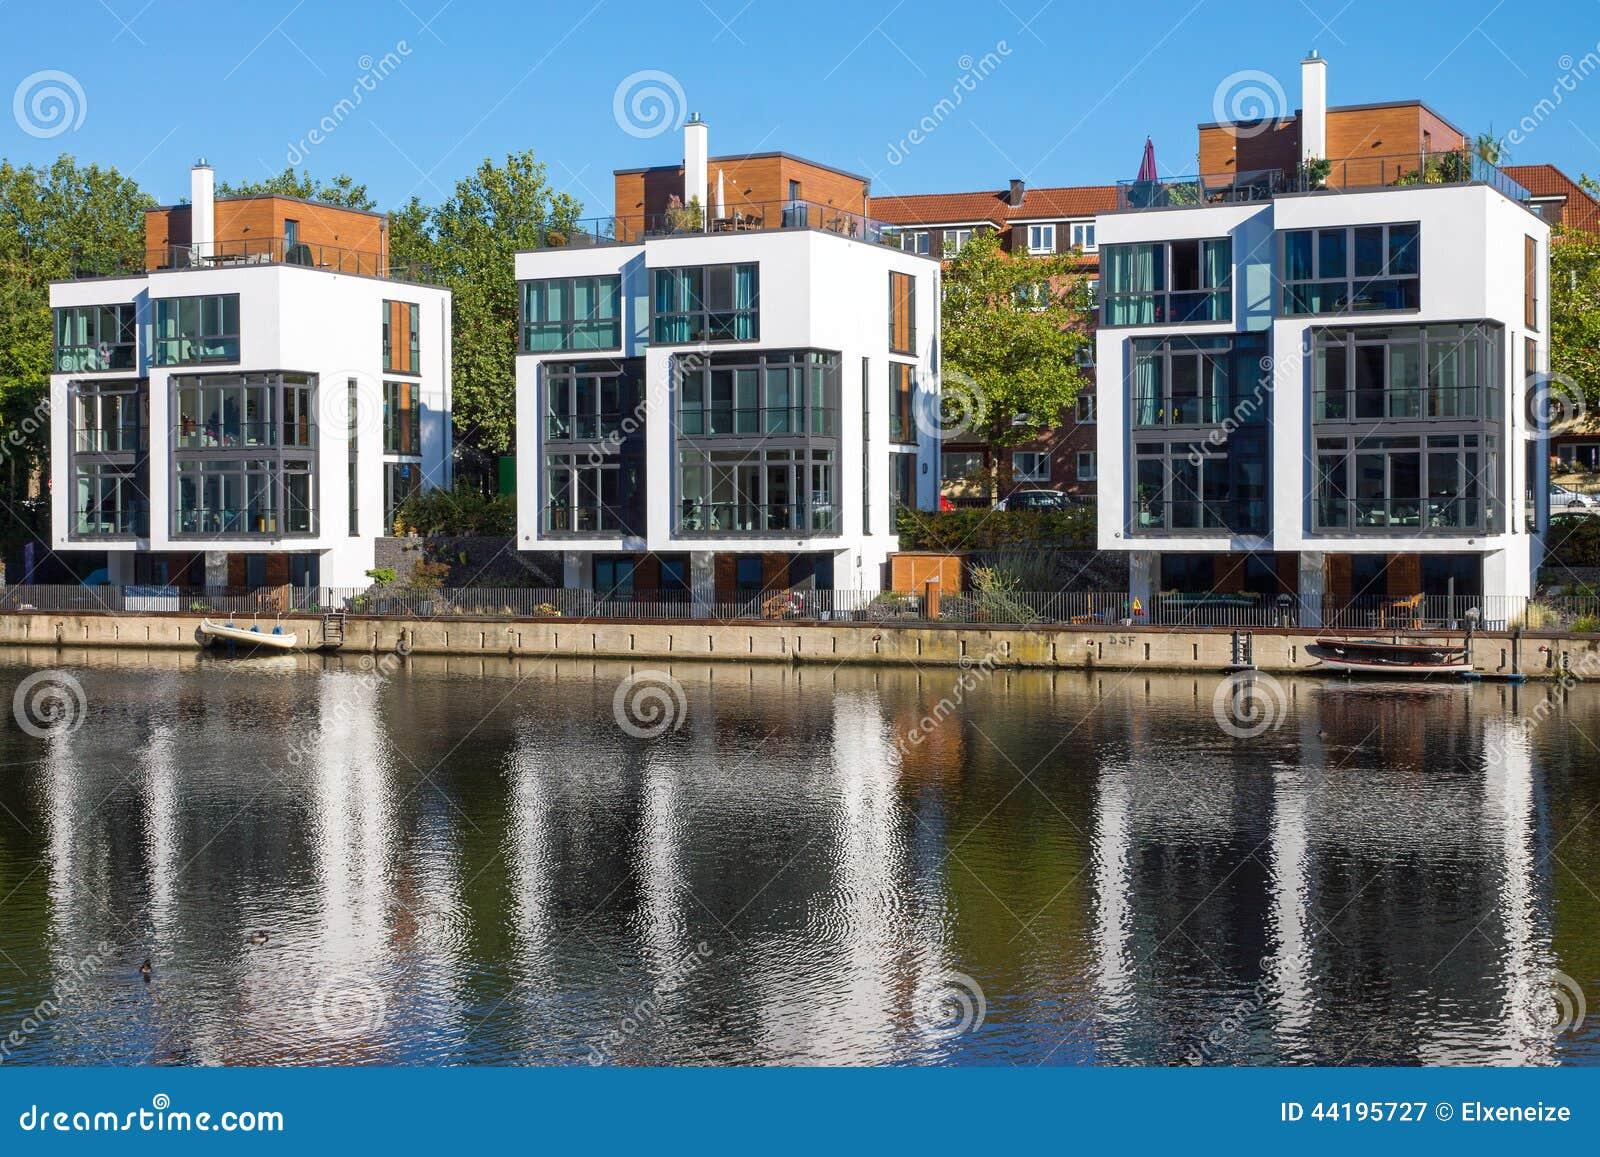 Moderne Wohnhäuser Stockfoto - Bild: 44195727 size: 1300 x 957 post ID: 5 File size: 0 B